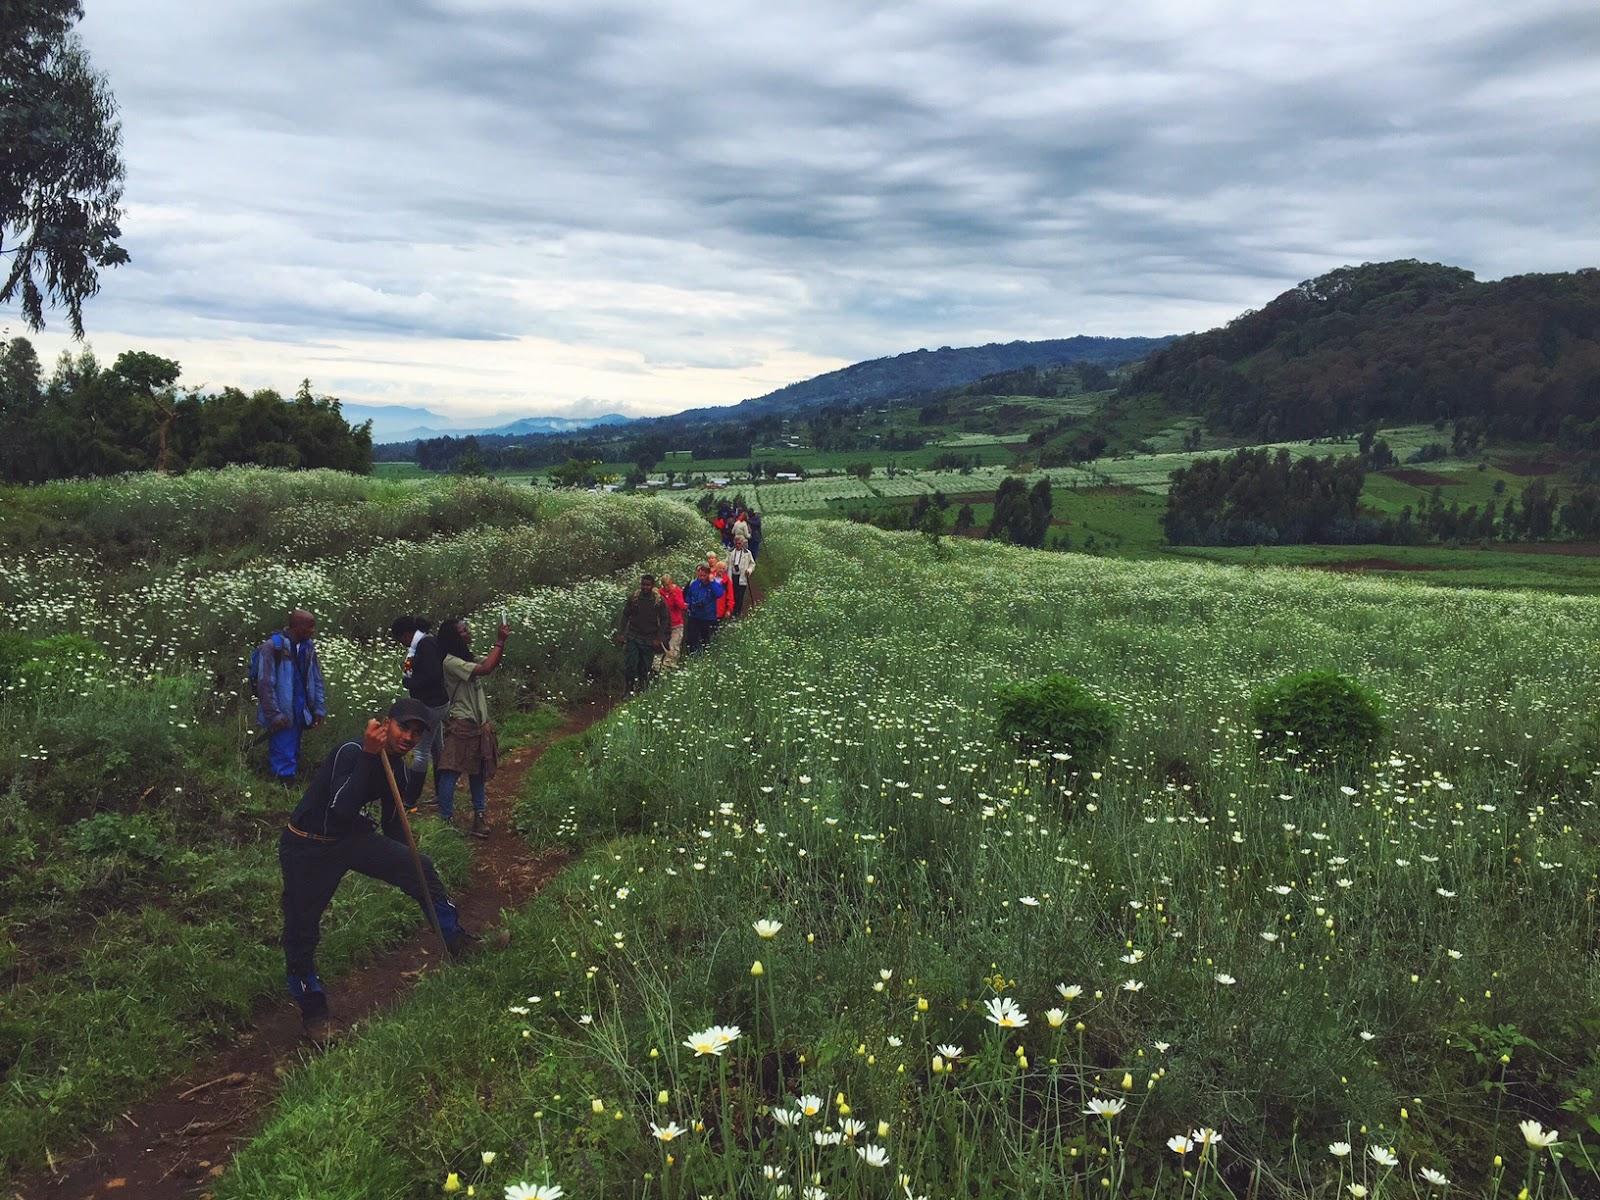 amahoro family mountain gorillas volcaoes national park rwanda africa trek